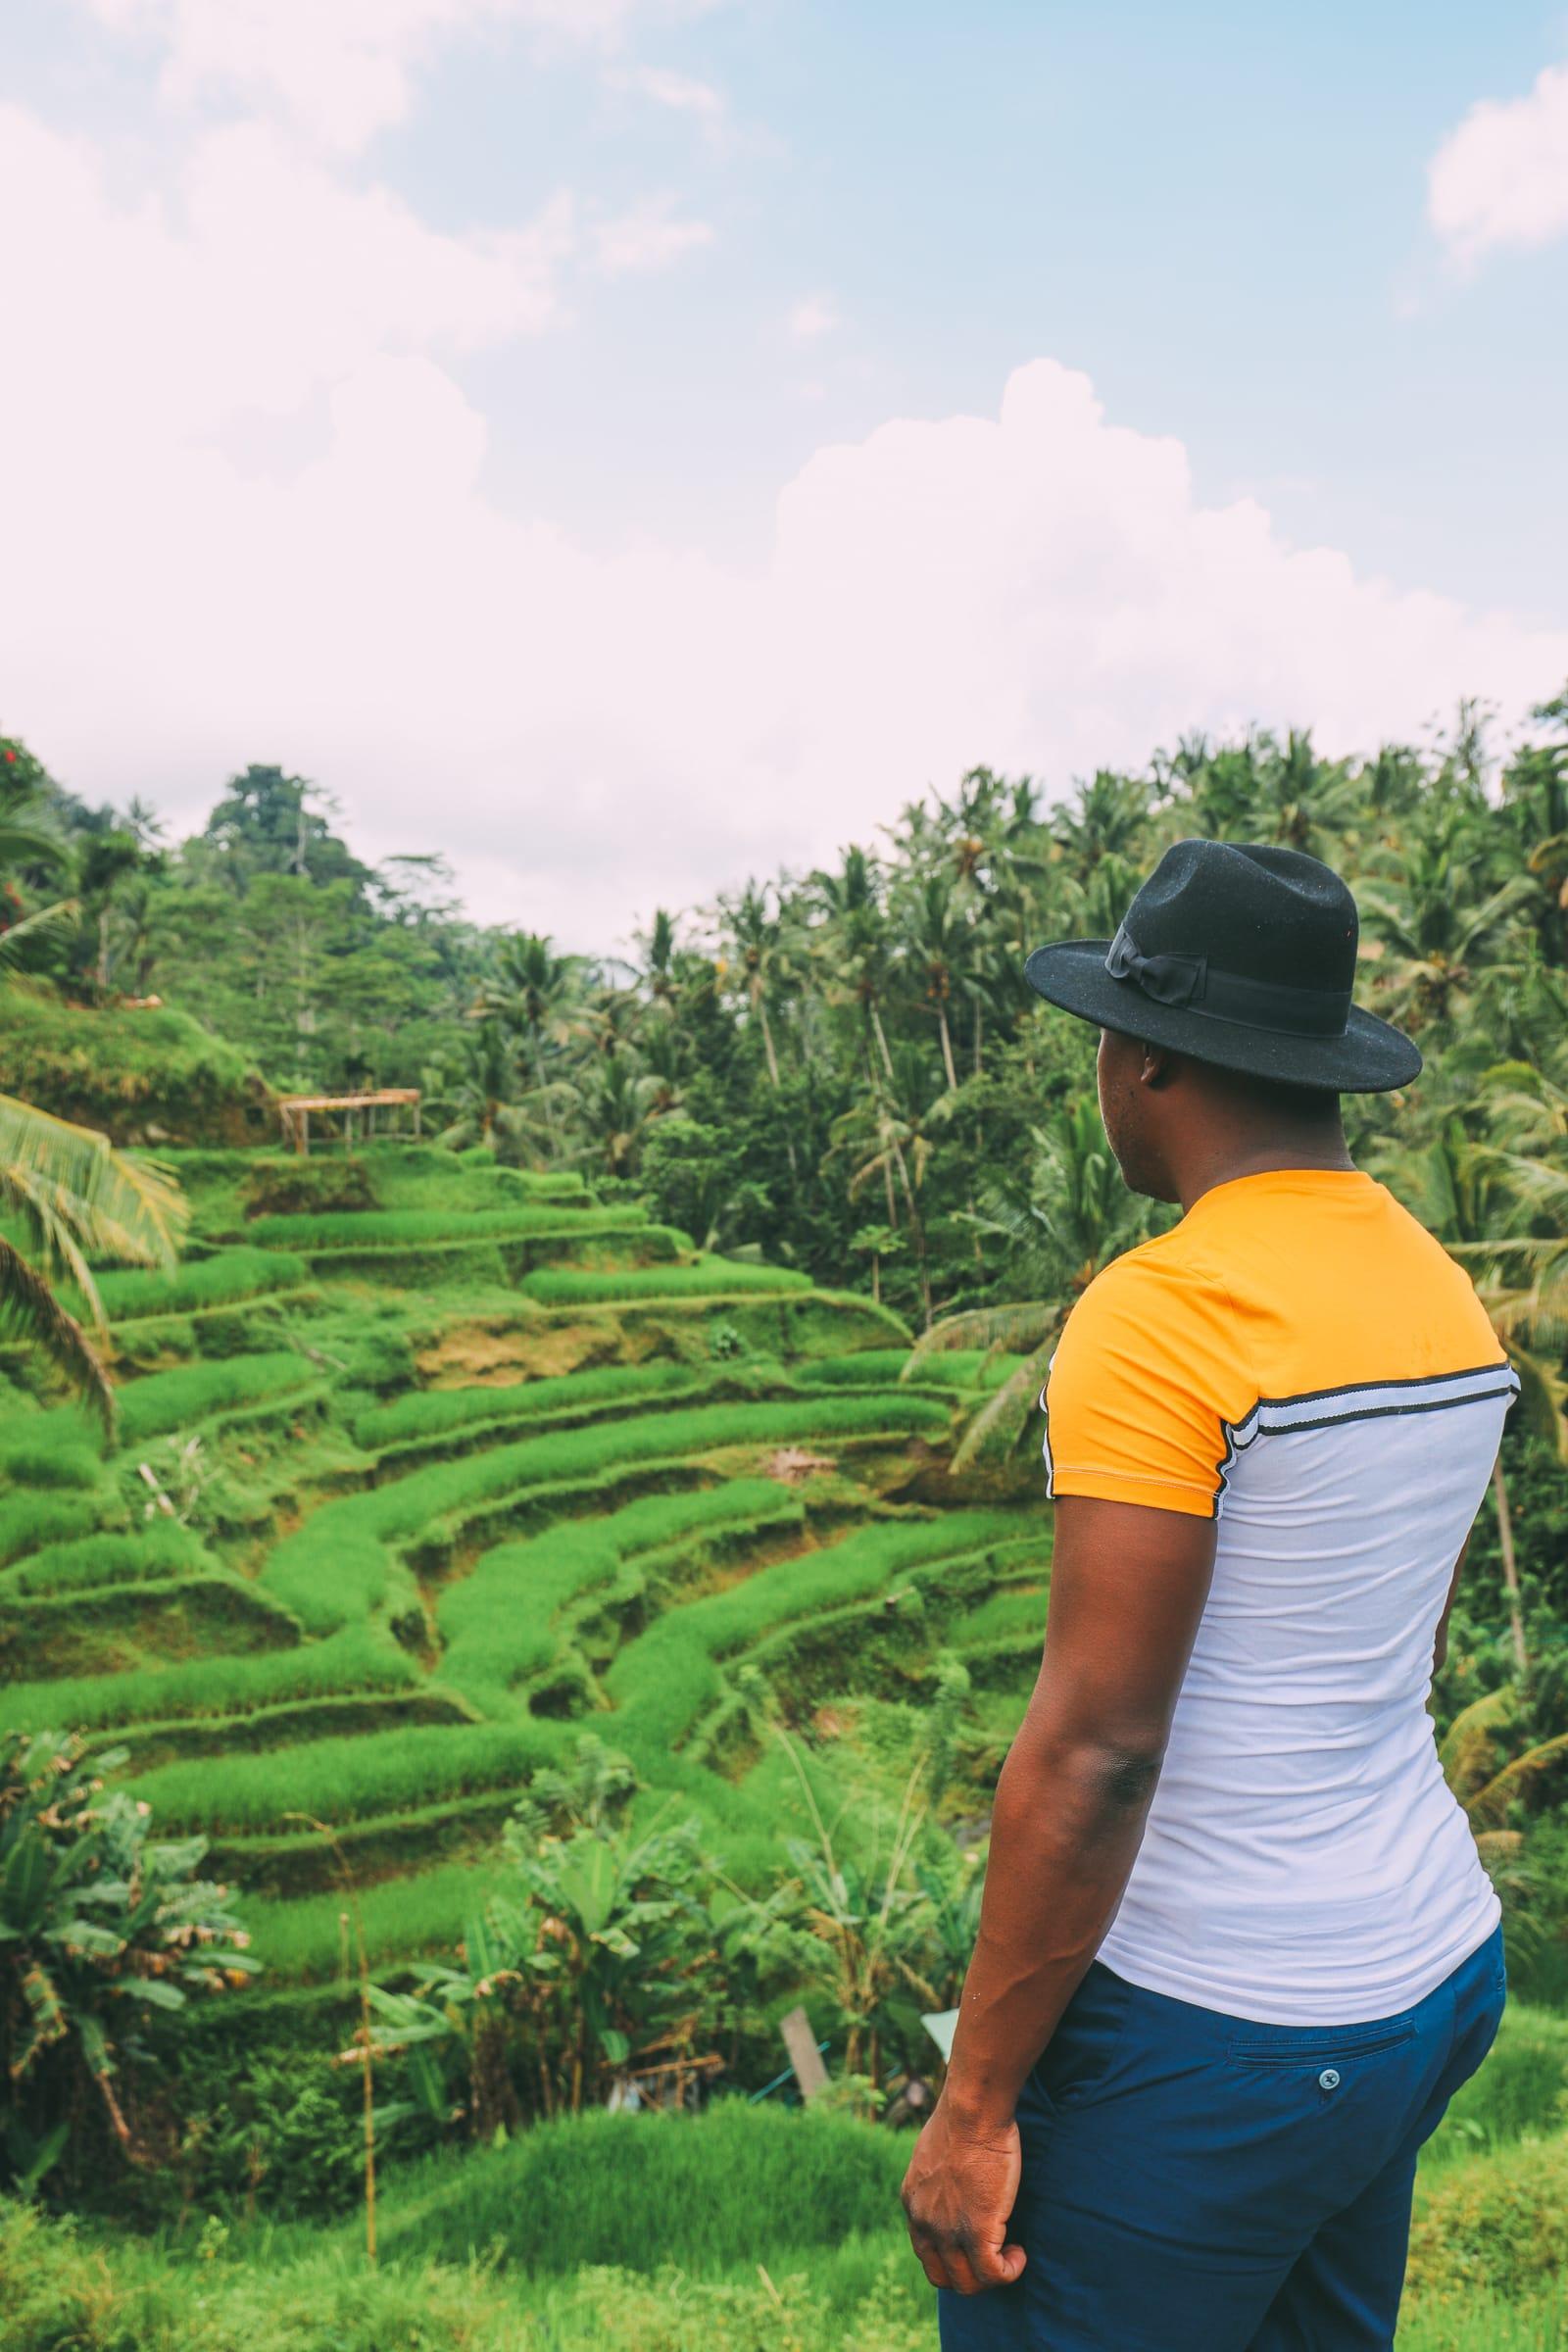 Bali Travel - Tegalalang Rice Terrace In Ubud And Gunung Kawi Temple (9)